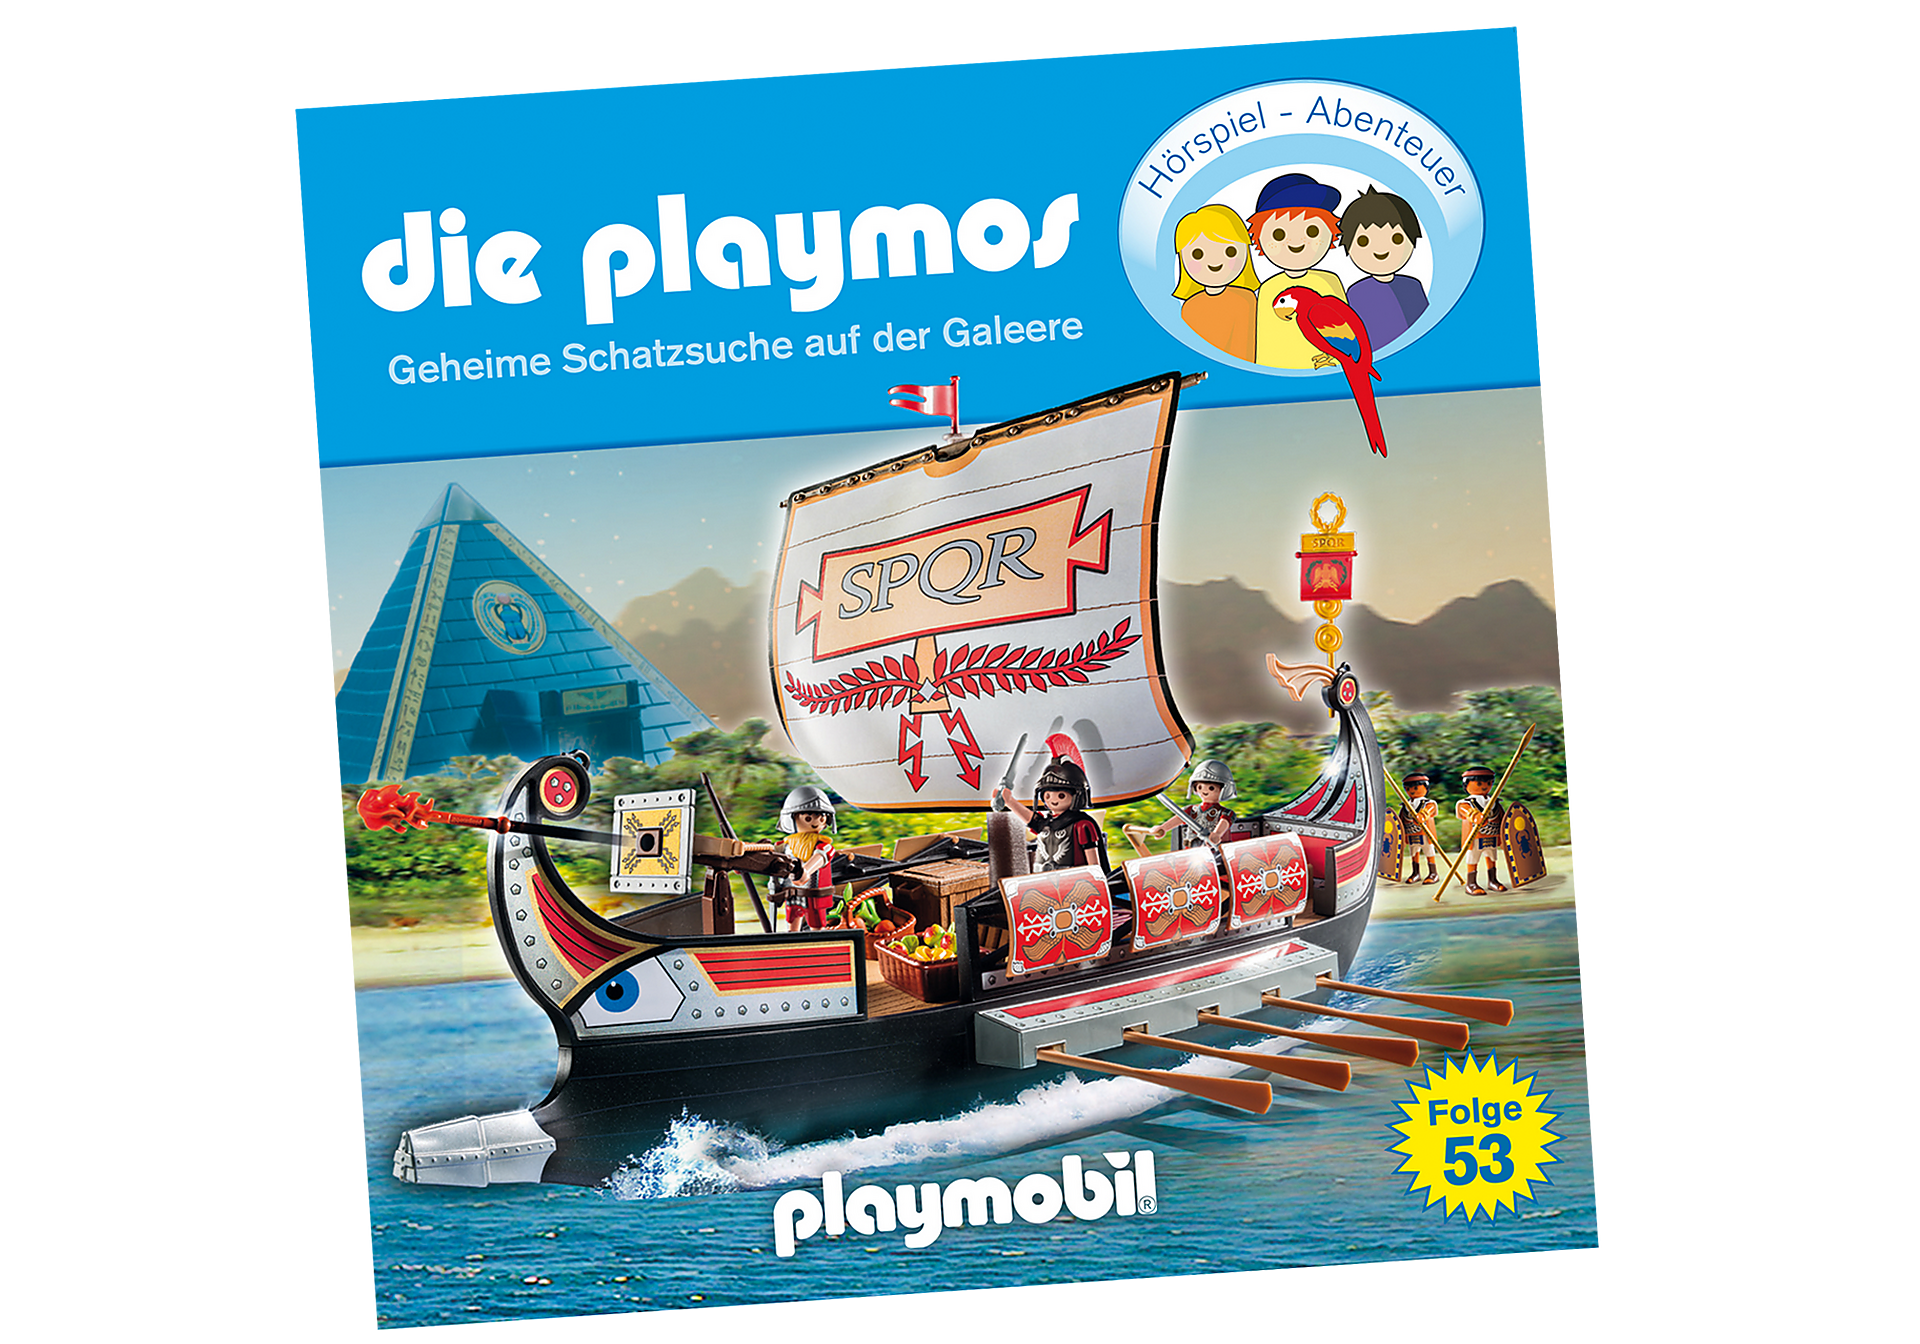 http://media.playmobil.com/i/playmobil/80482_product_detail/Geheime Schatzsuche auf der Galeere - Folge 53